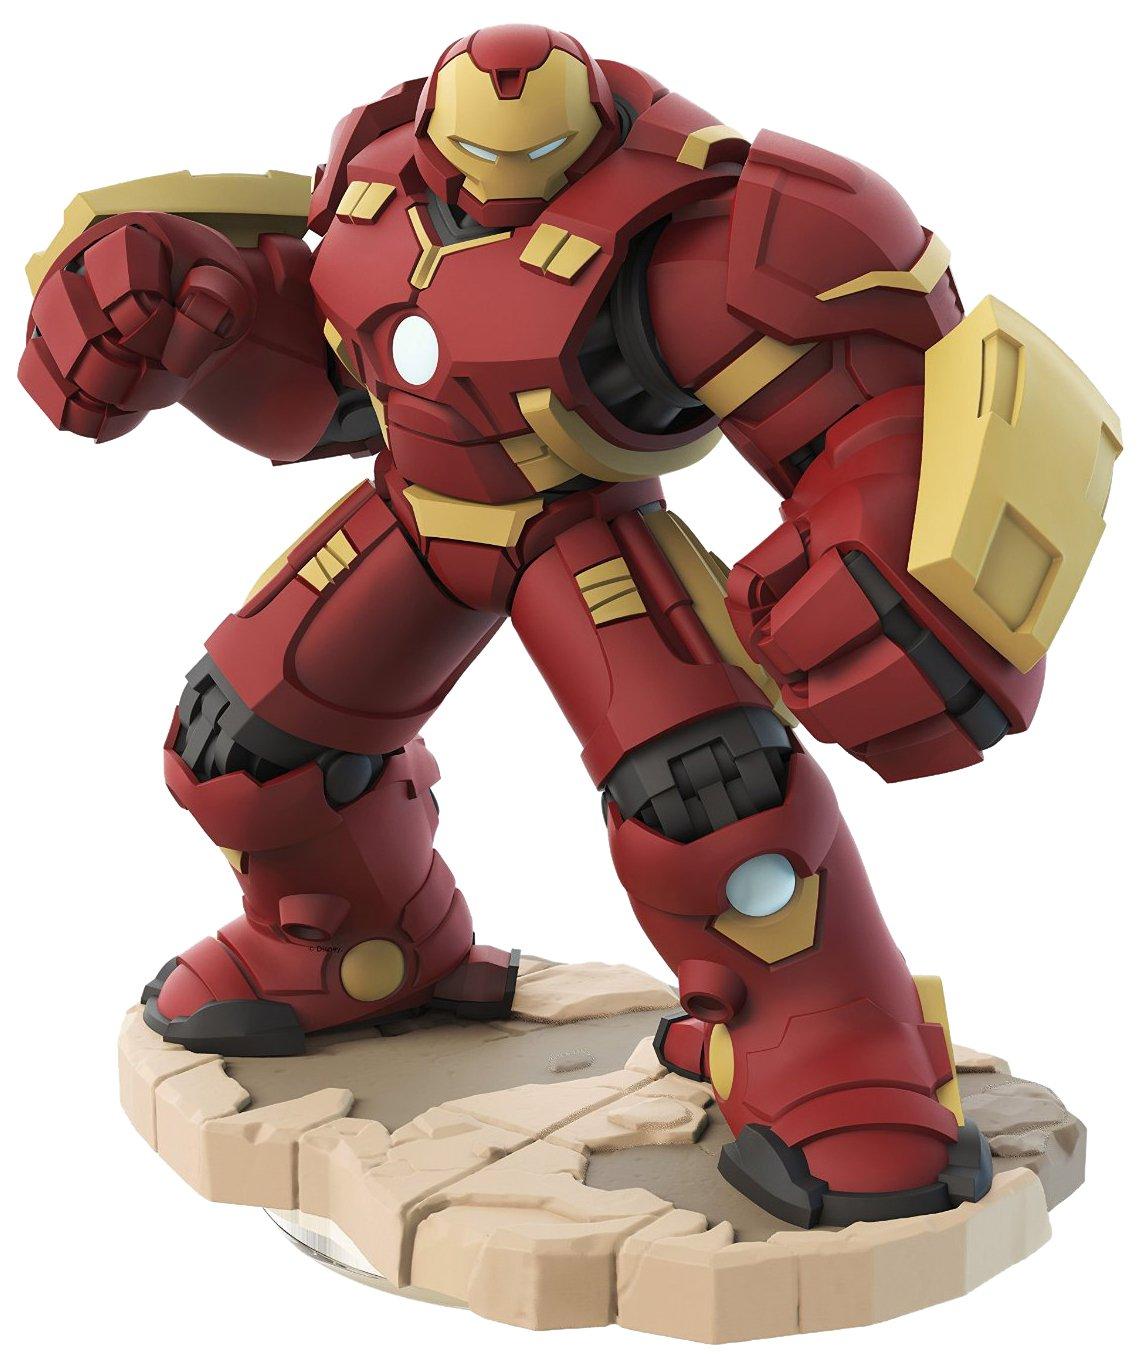 Disney Infinity 3.0 Editon: MARVEL's Hulkbuster Figure by Disney Infinity (Image #2)